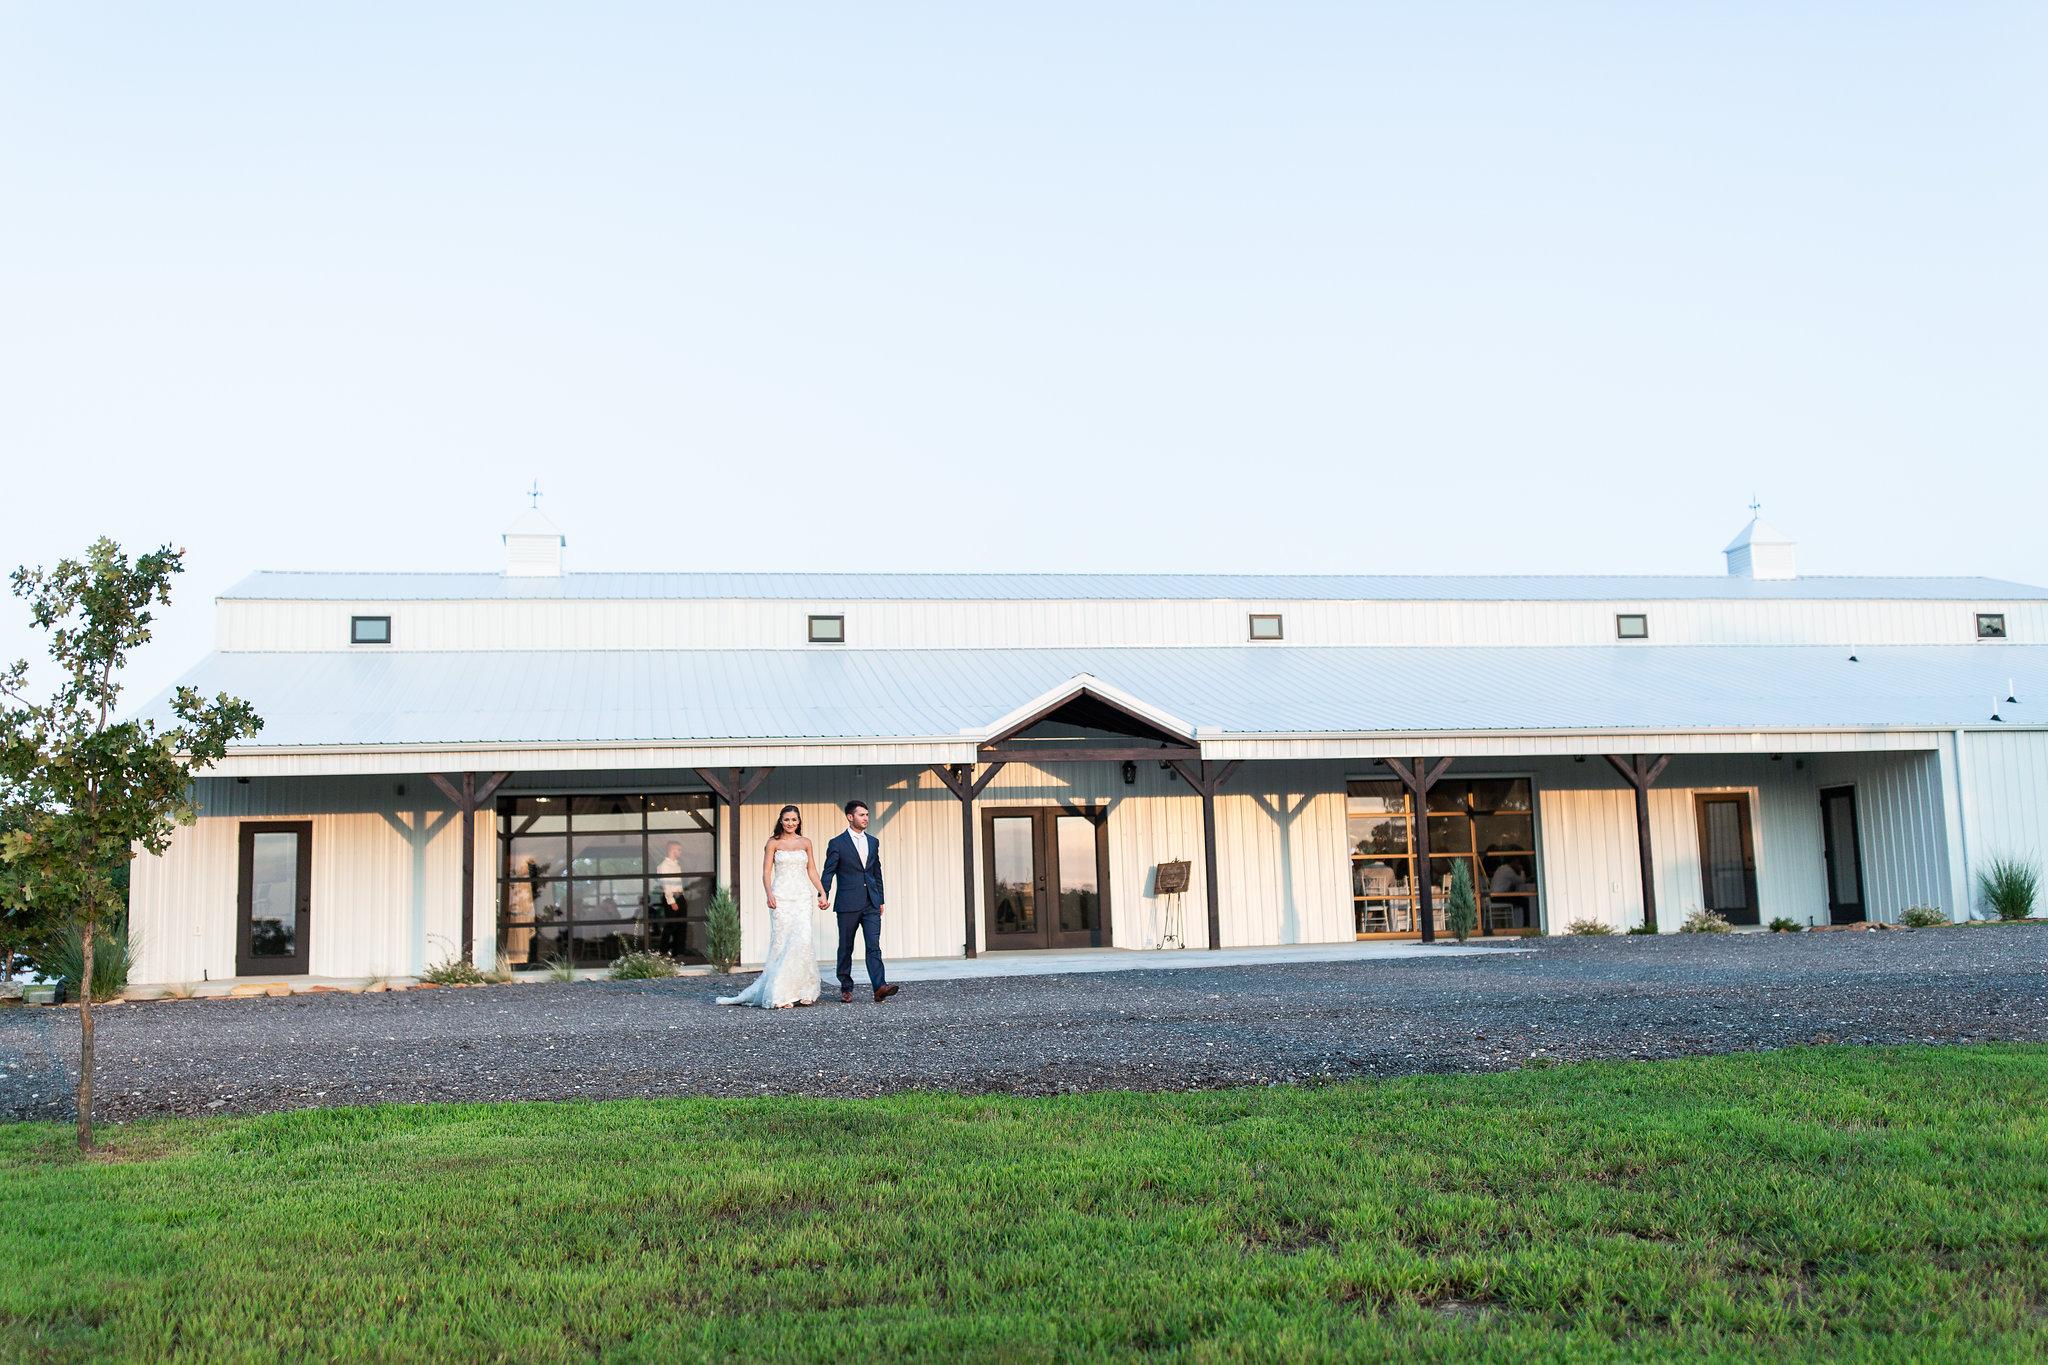 tulsa wedding venue white barn 6.jpg